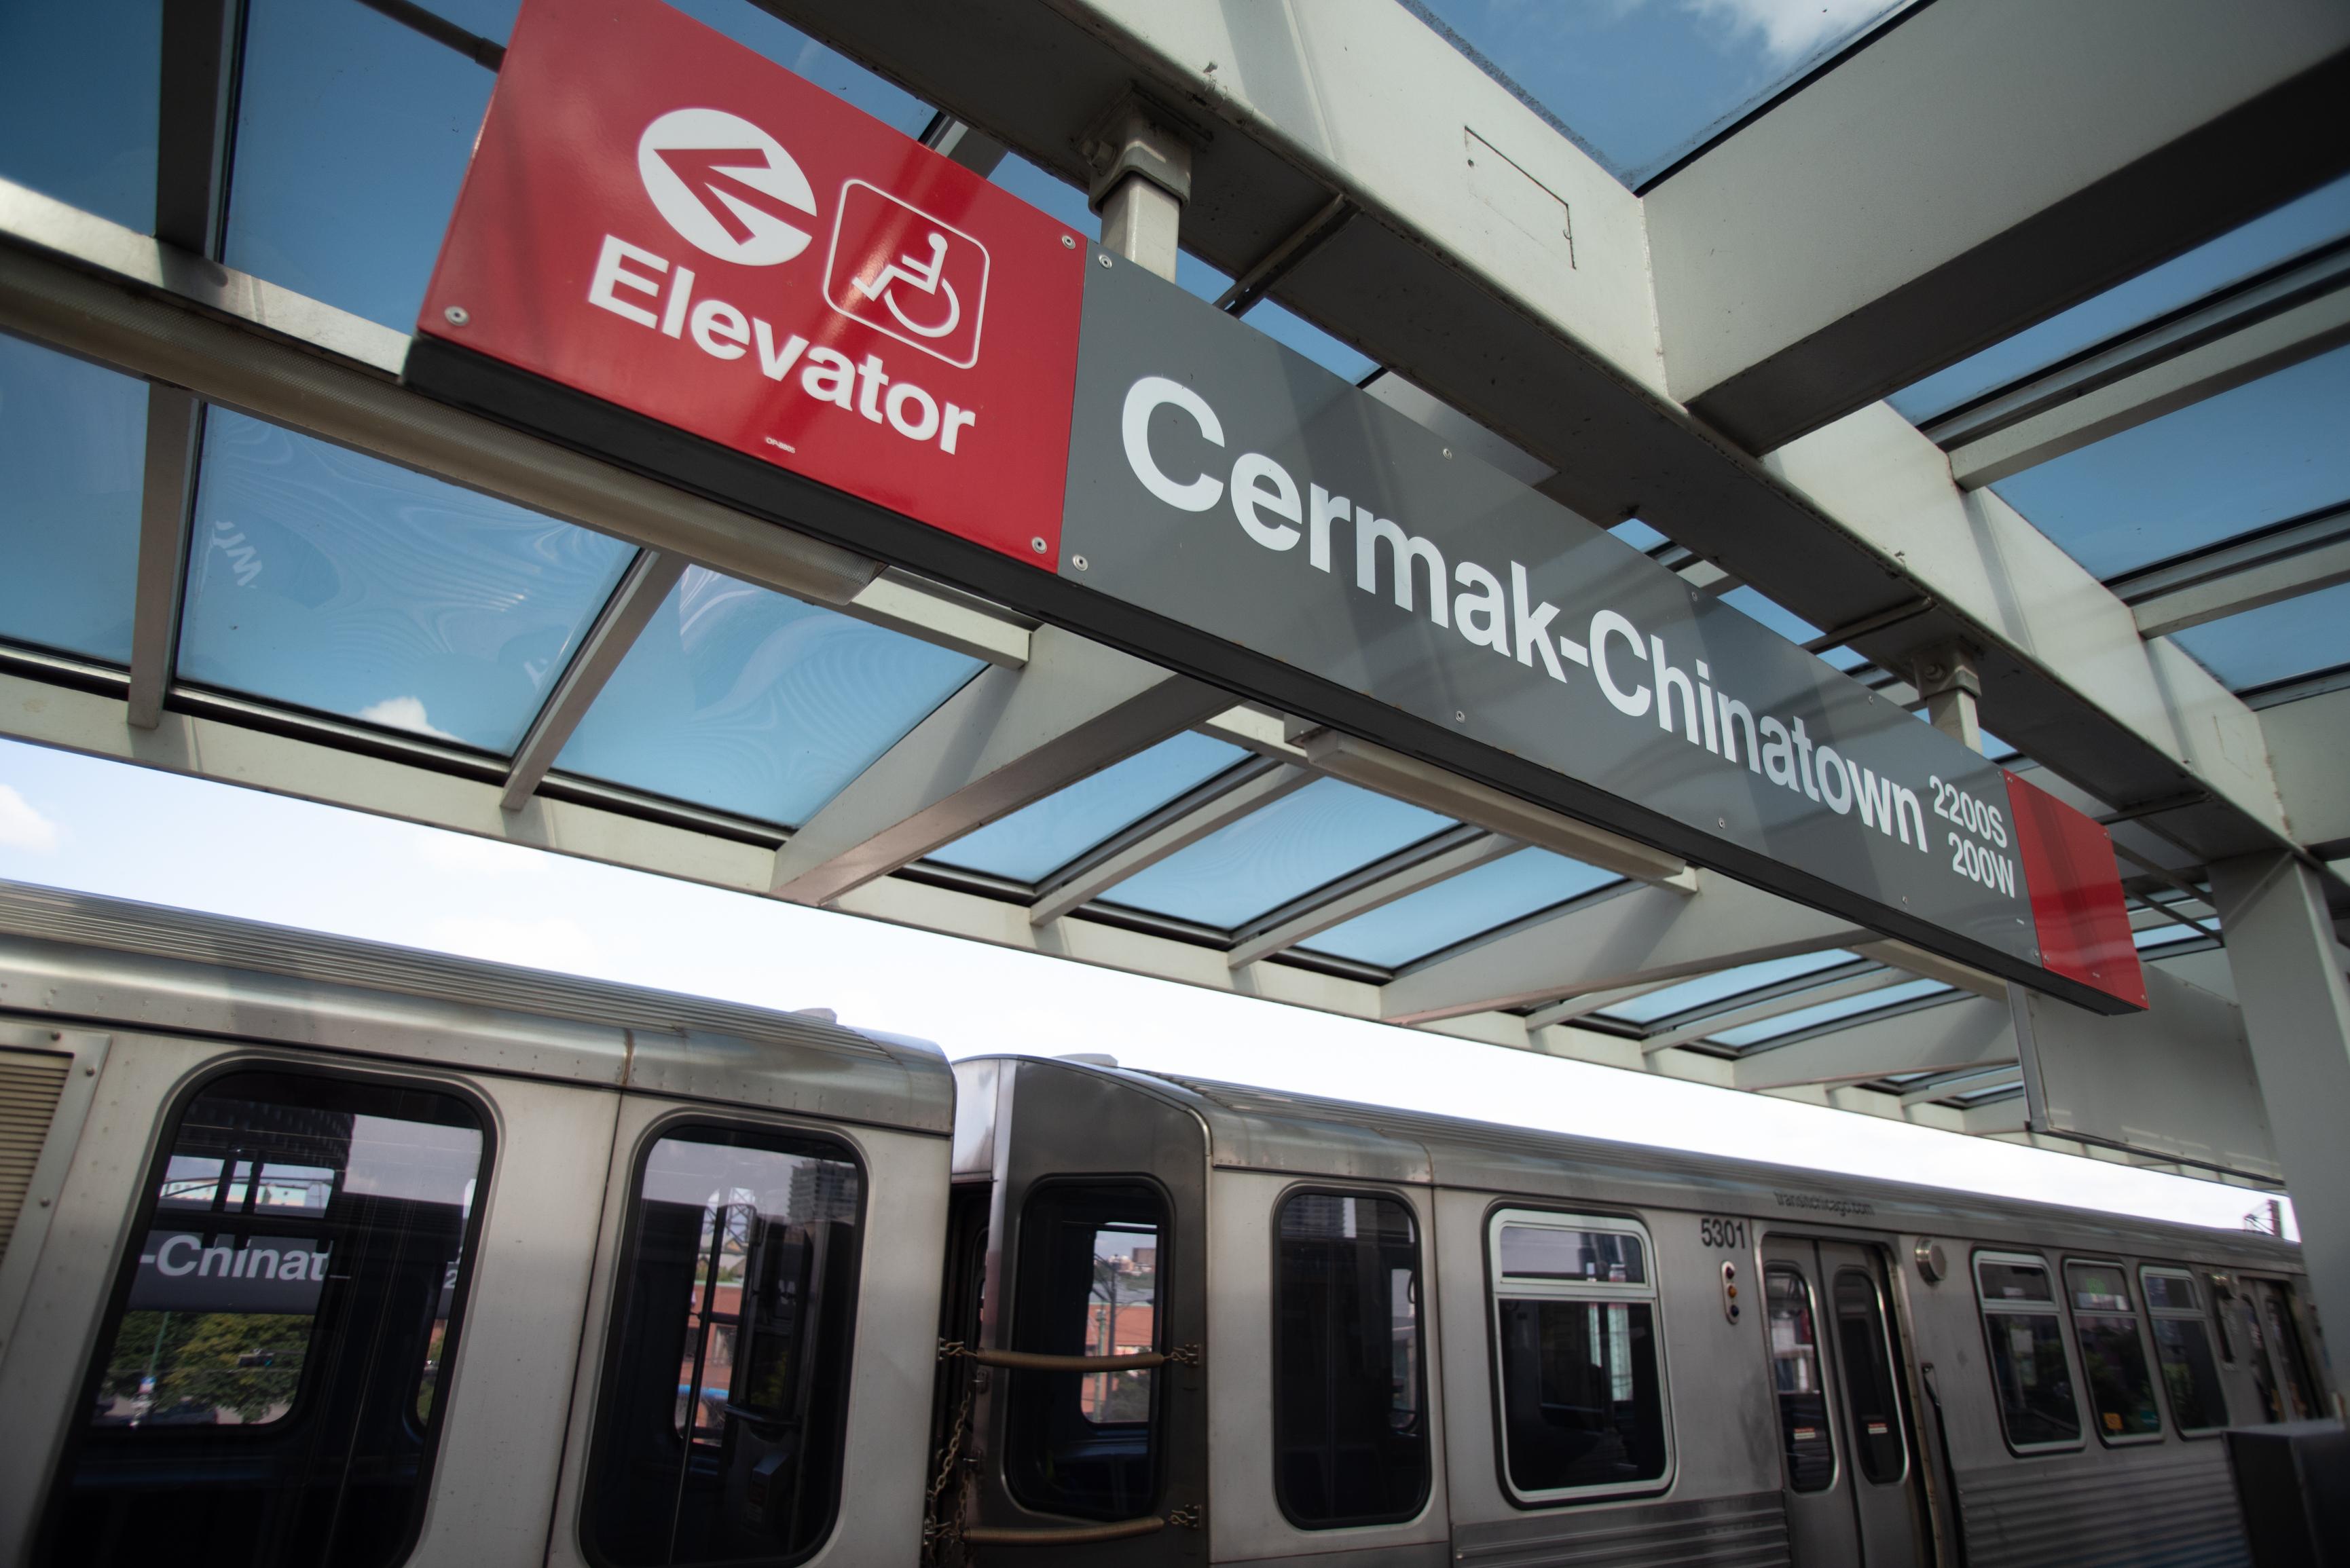 The Cermak-Chinatown CTA stop. | Colin Boyle/Sun-Times